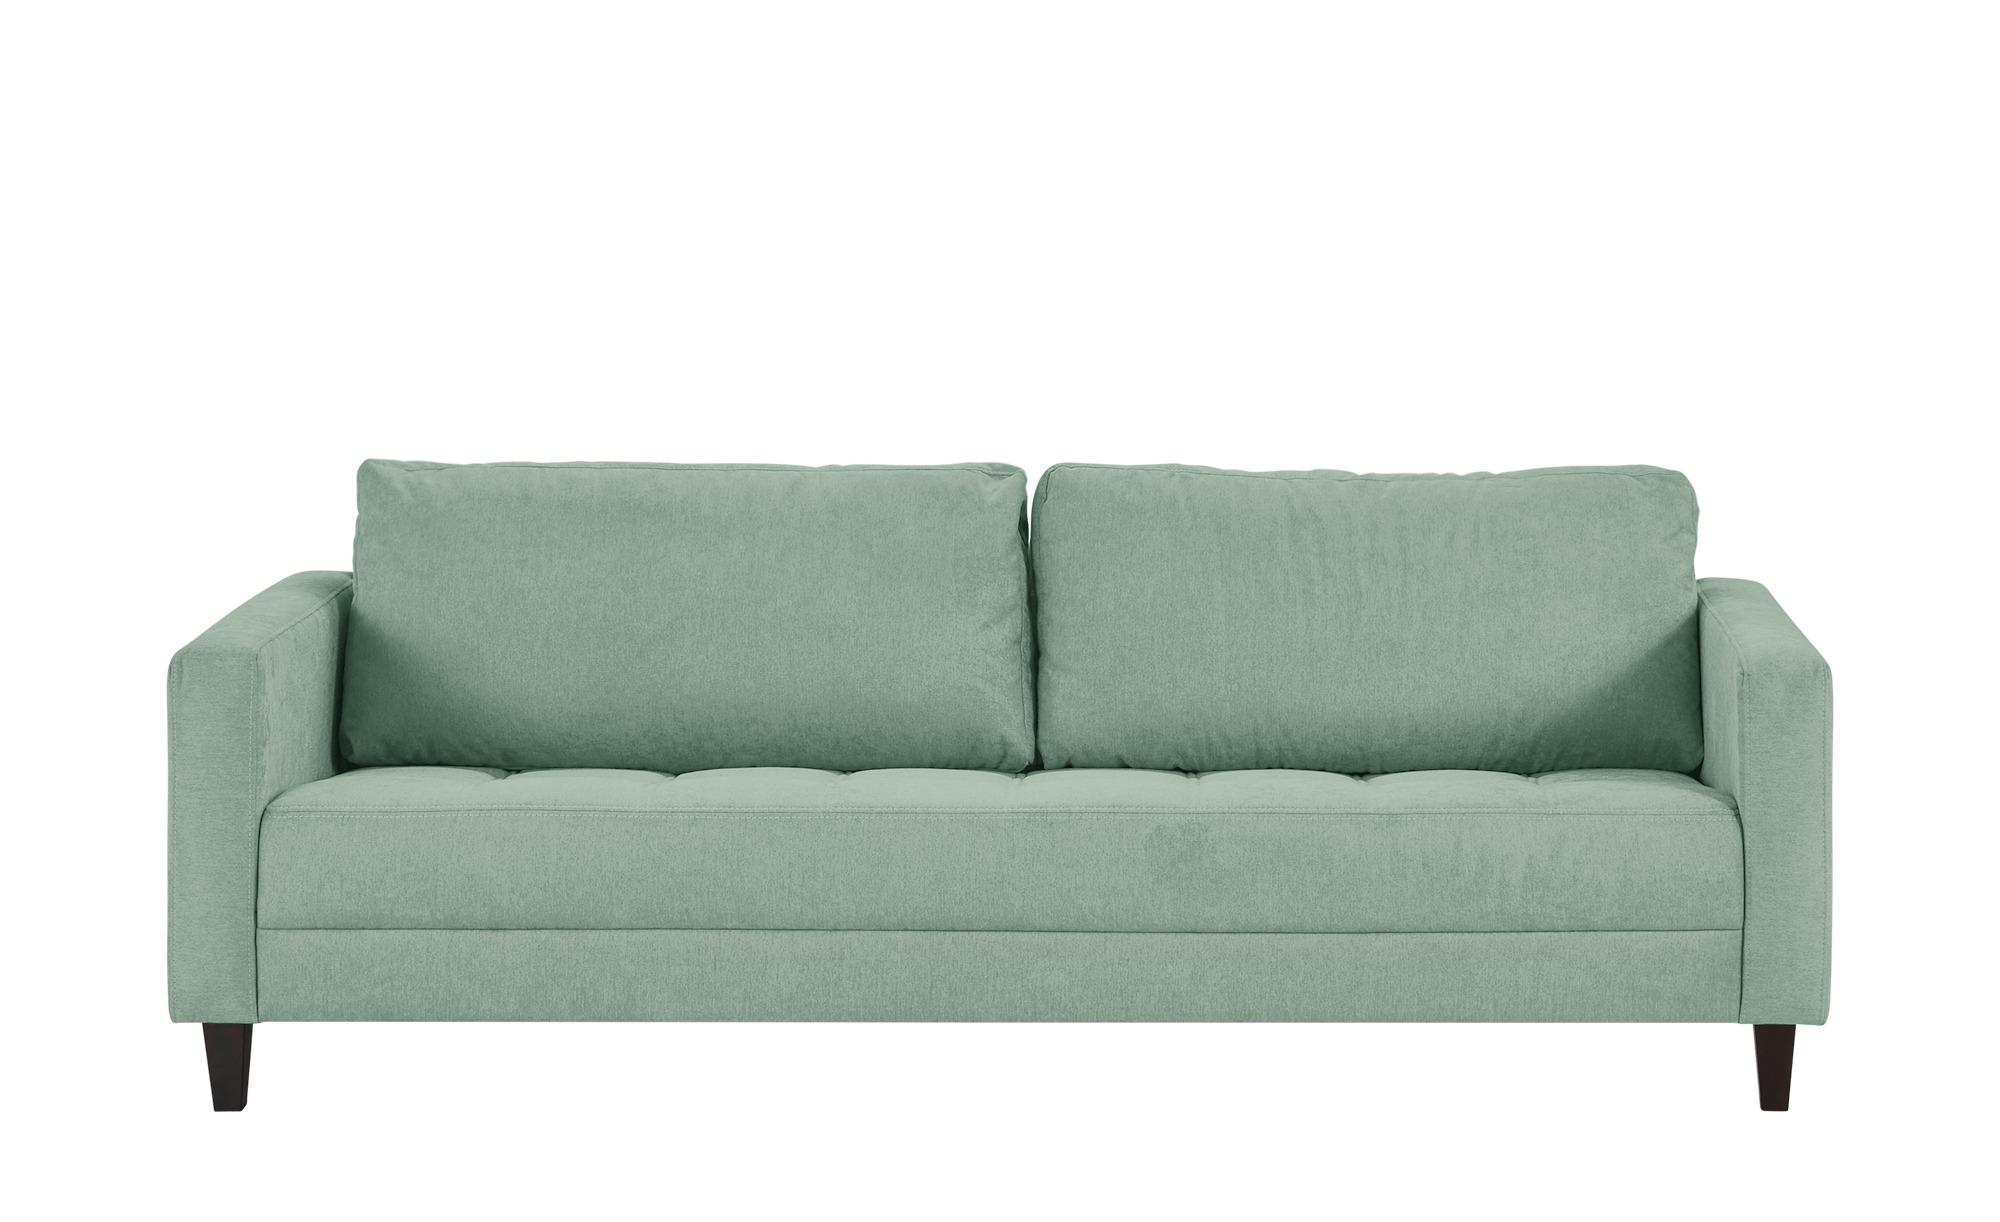 smart Sofa mintgrün - Flachgewebe Geradine ¦ grün ¦ Maße (cm): B: 228 H: 83 T: 91 Polstermöbel > Sofas > 3-Sitzer - Höffner